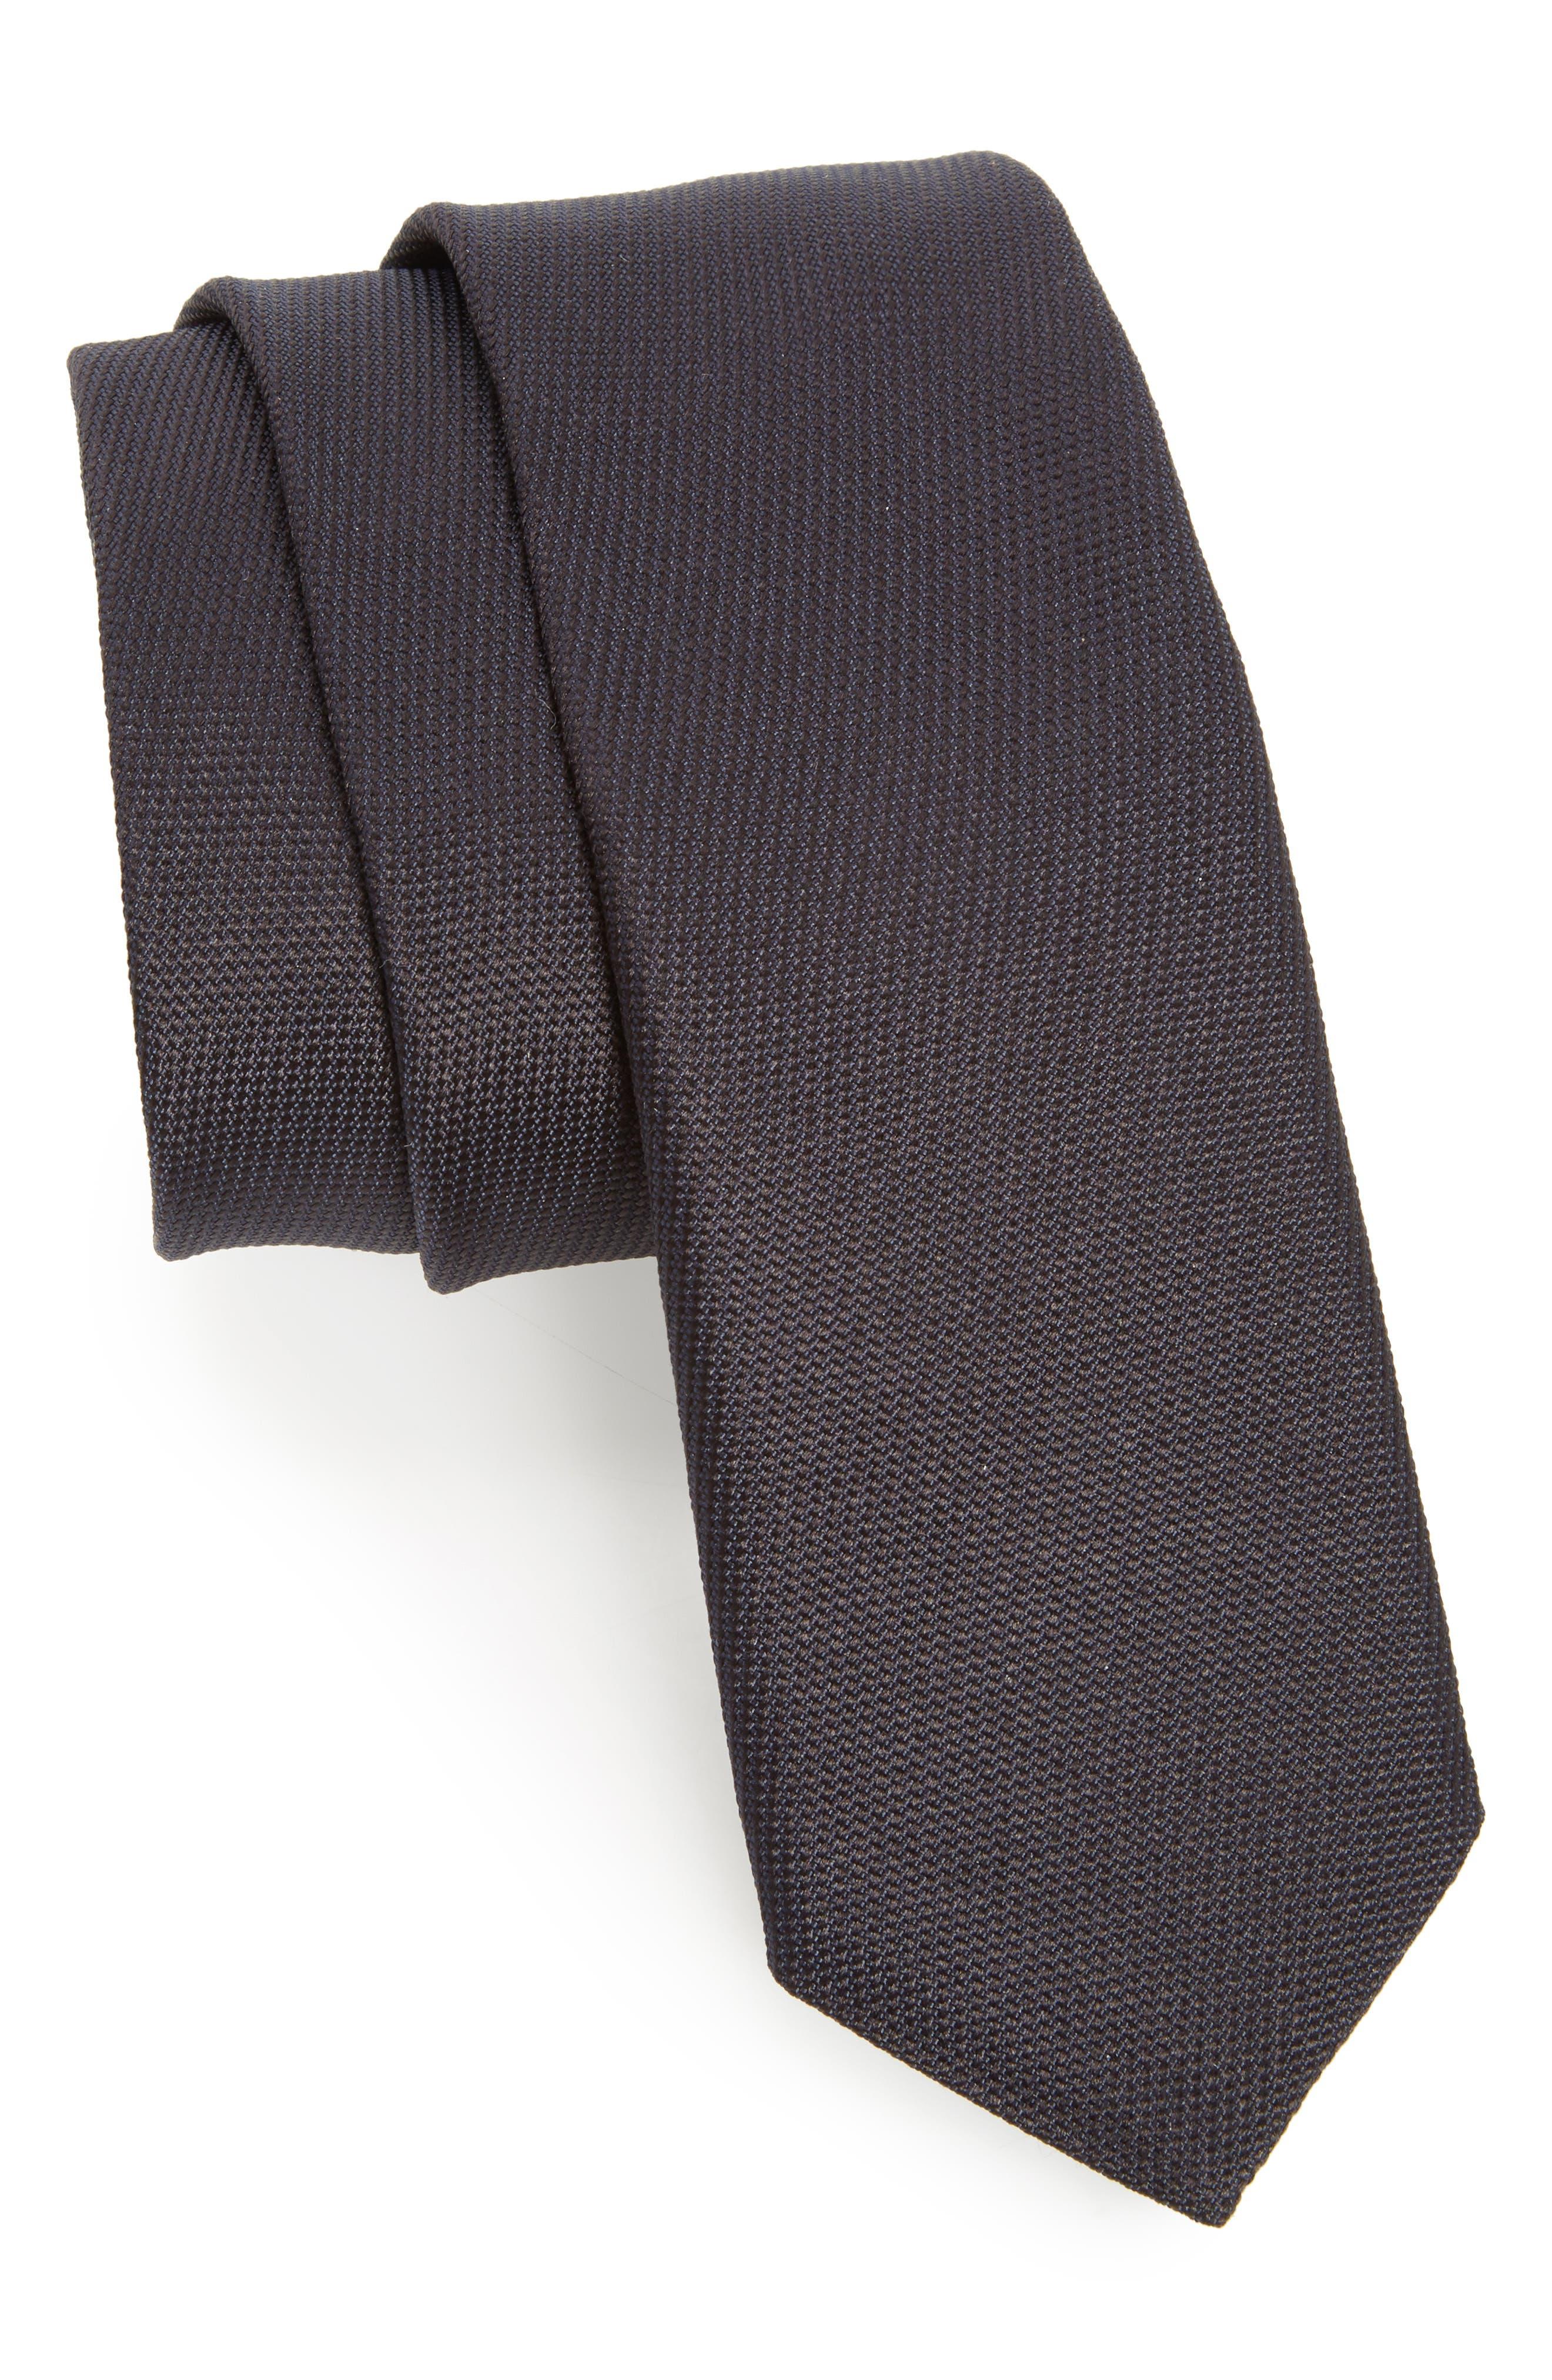 Nordstrom x BOSS Silk Tie,                             Main thumbnail 1, color,                             Blue